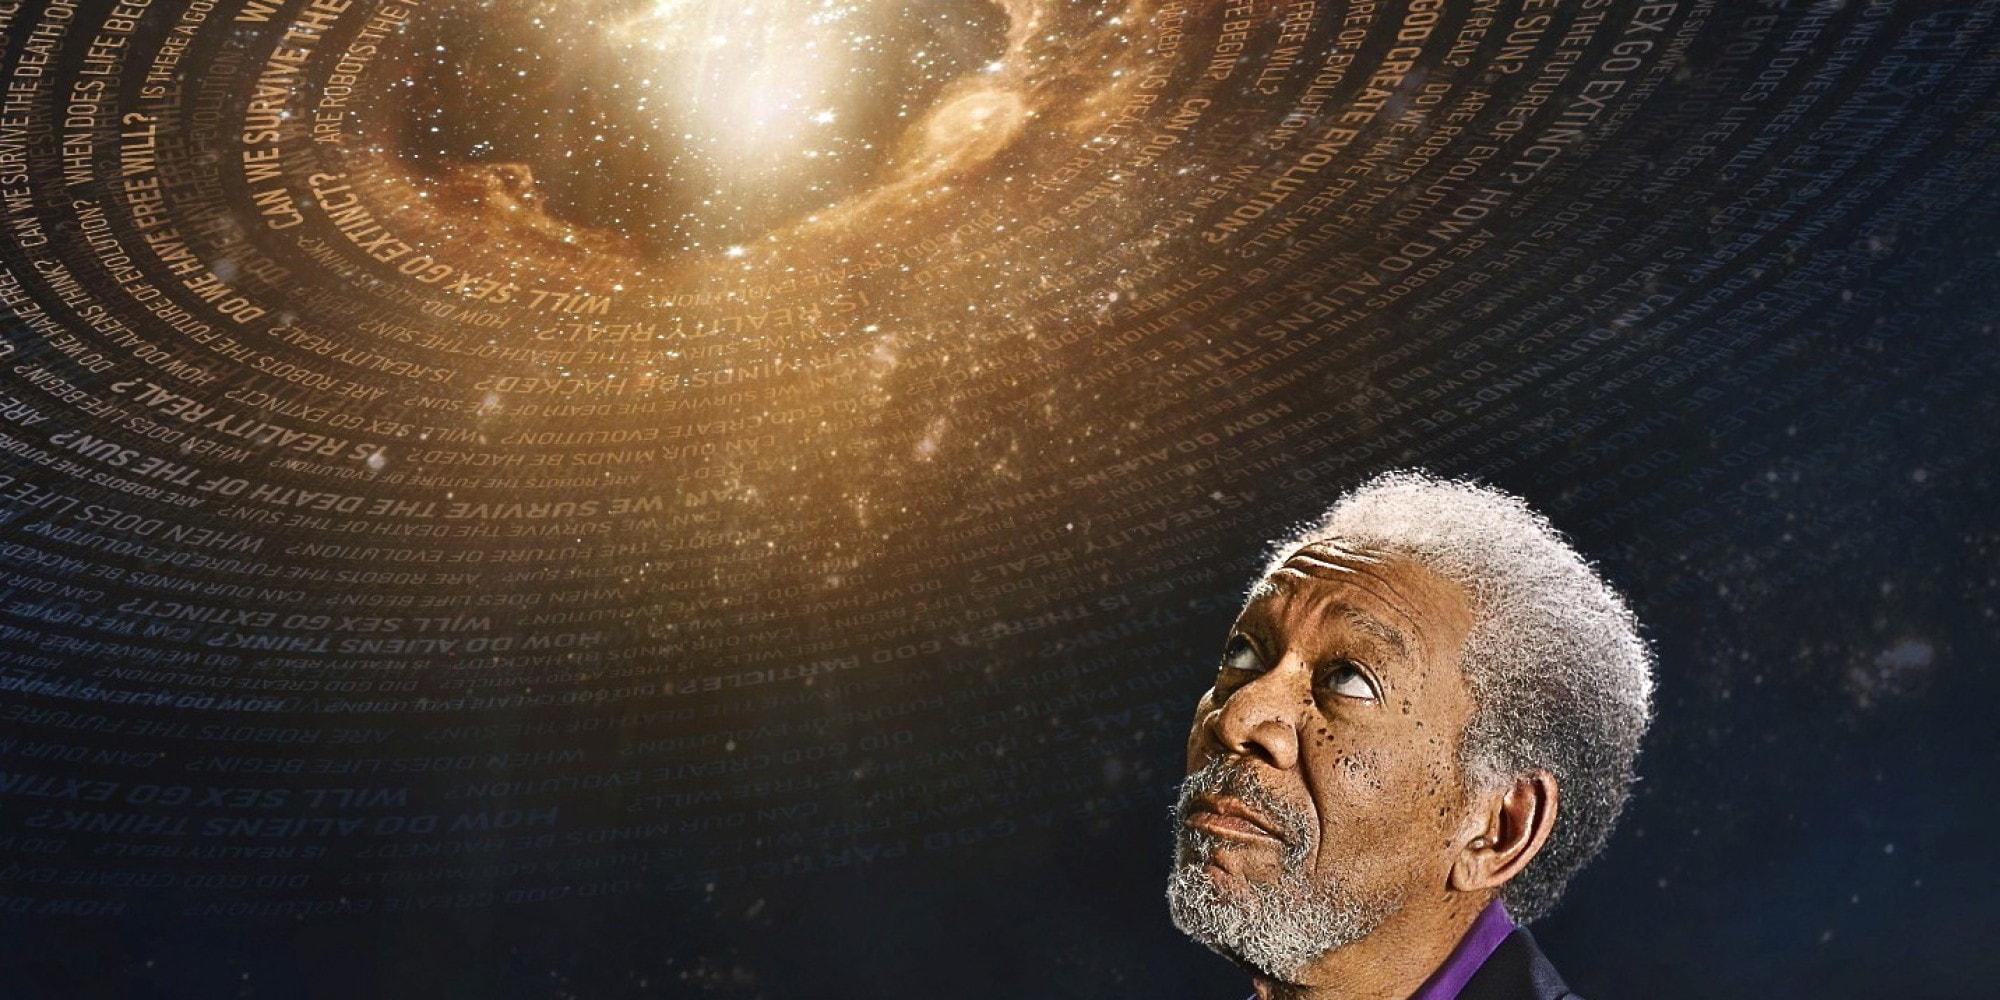 Morgan Freeman Download